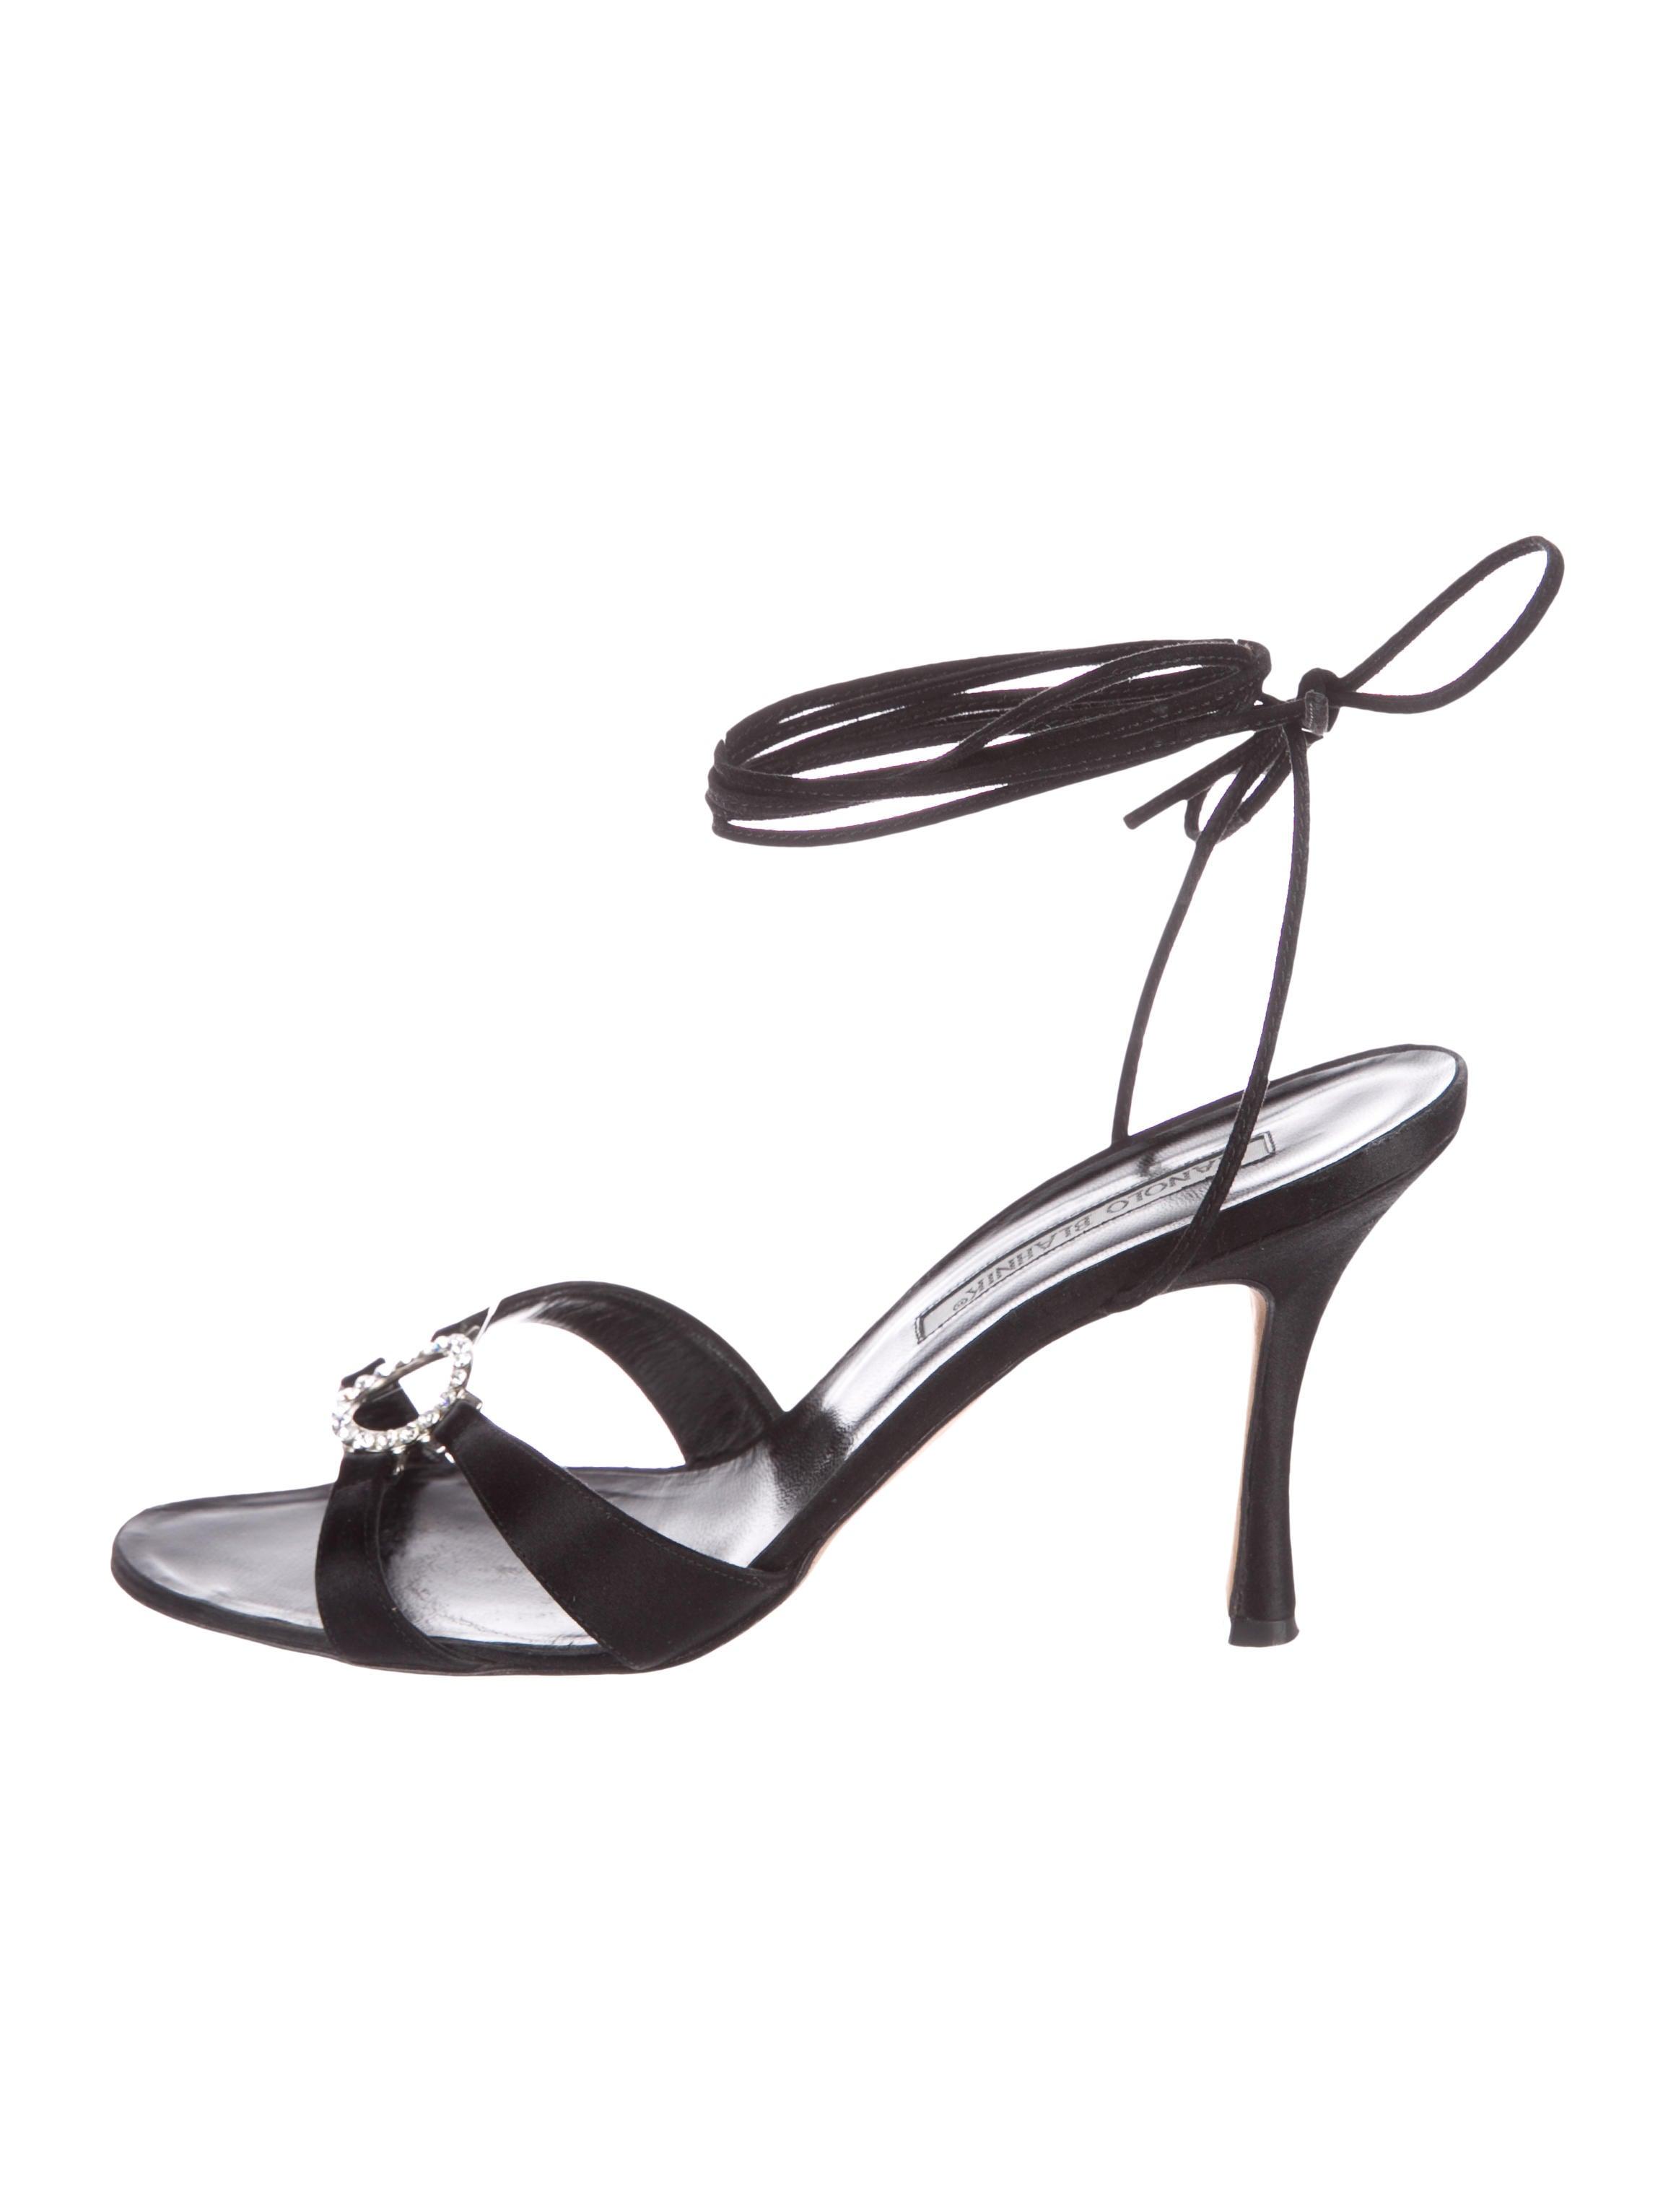 Manolo Blahnik Satin Wrap-Around Sandals cheap sale geniue stockist pDKp3odo